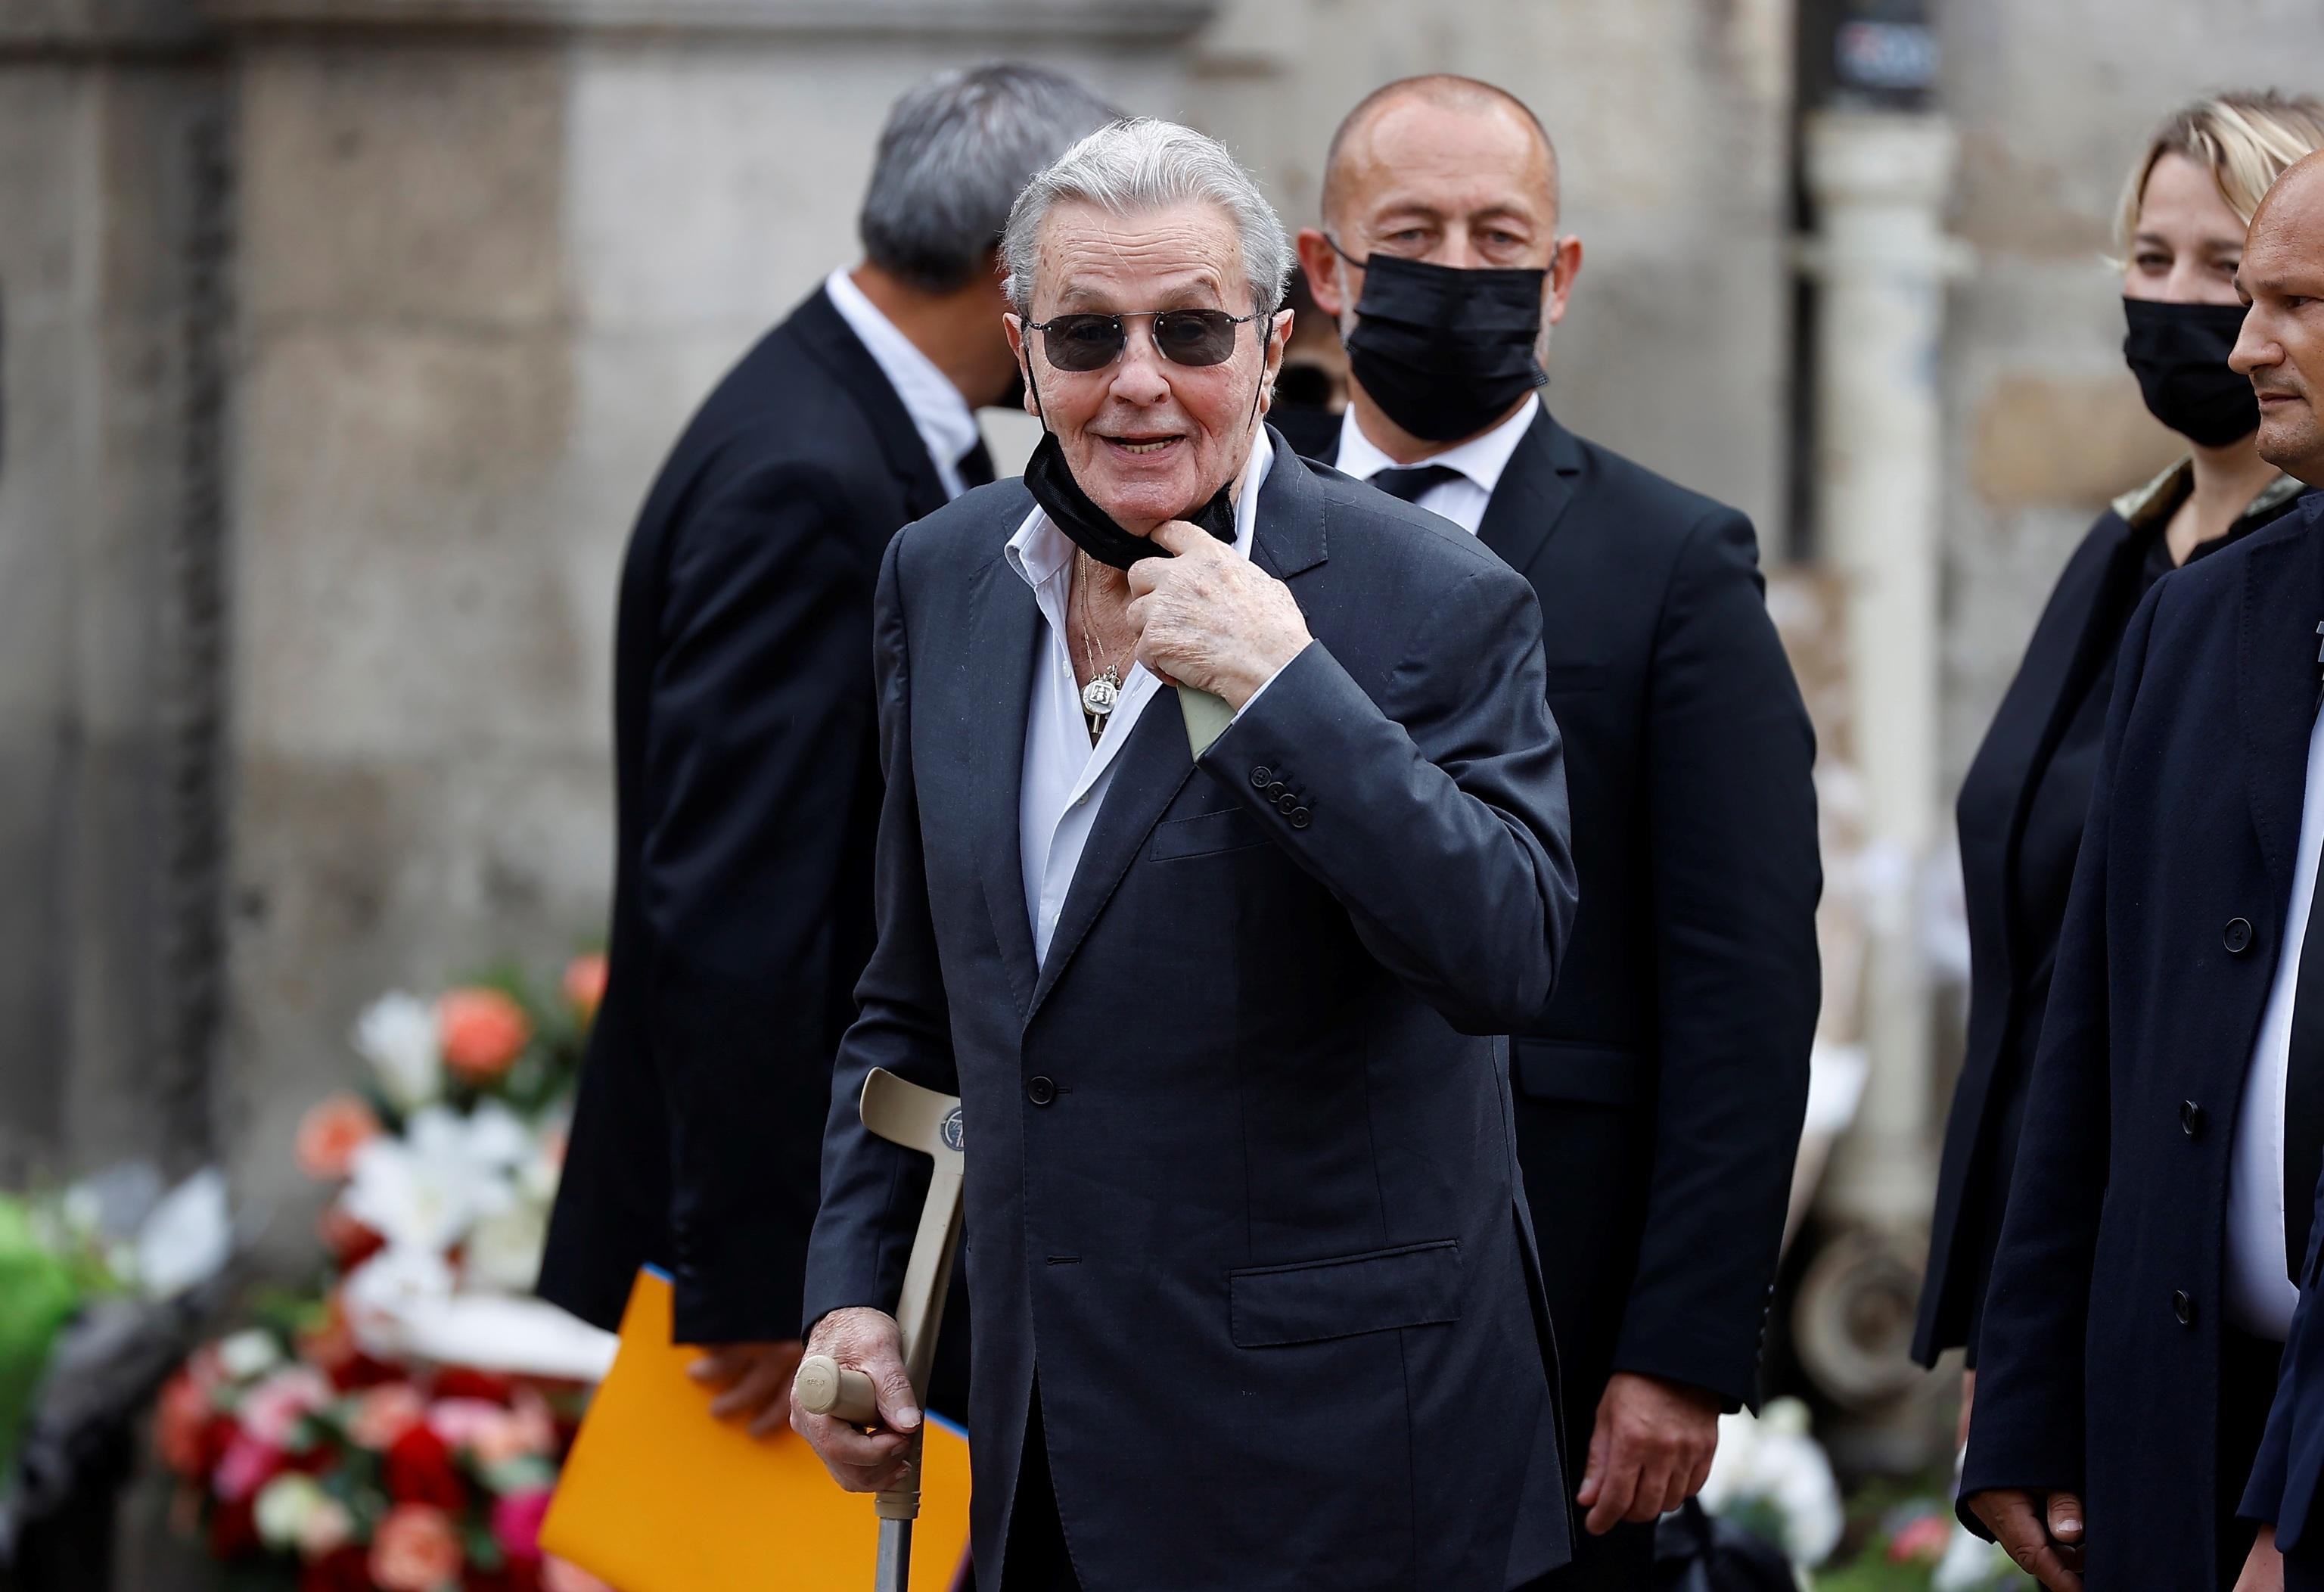 Alain Delon asiste al funeral de Jean-Paul Belmondo para despedirse de su némesis | Cine